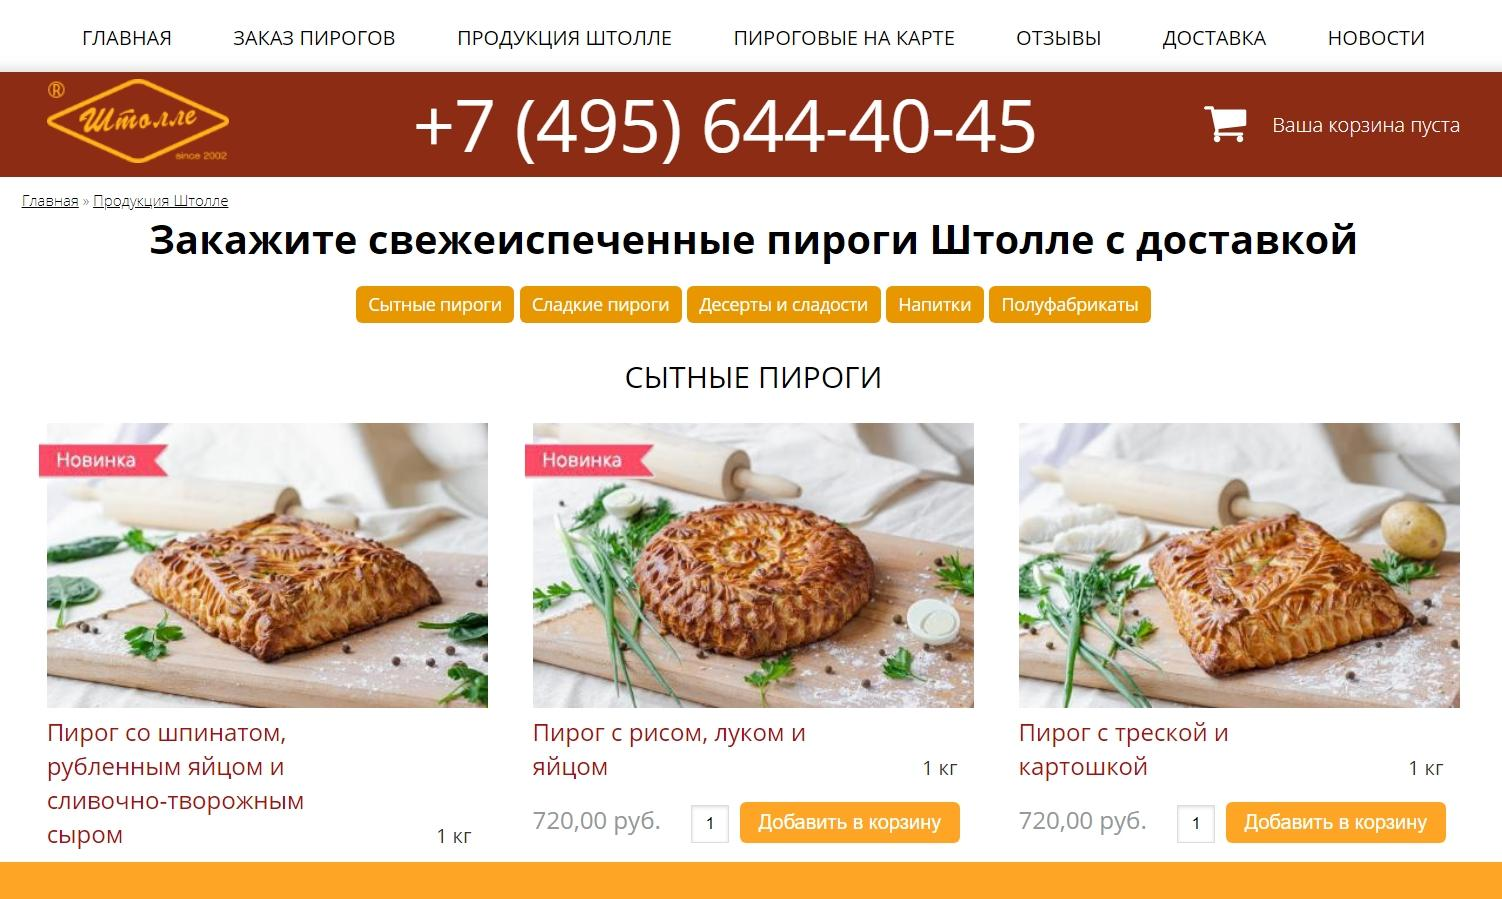 Страница заказа доставки пирогов